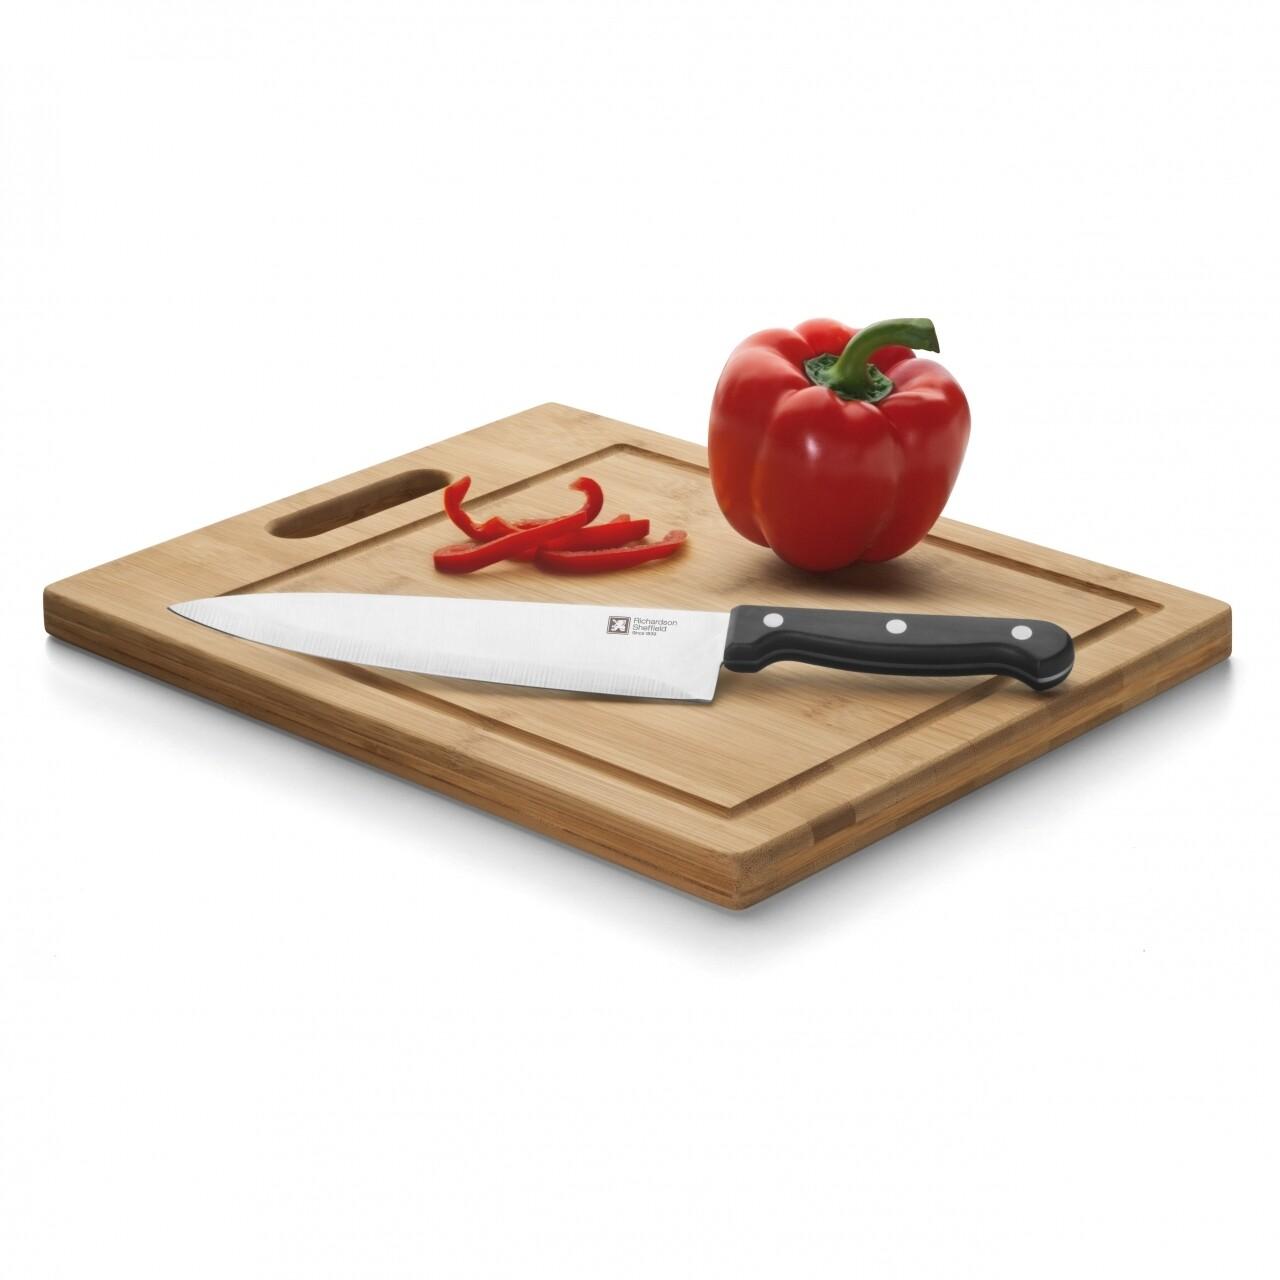 Set cutit chef si tocator 20 cm, Amefa, lemn/inox